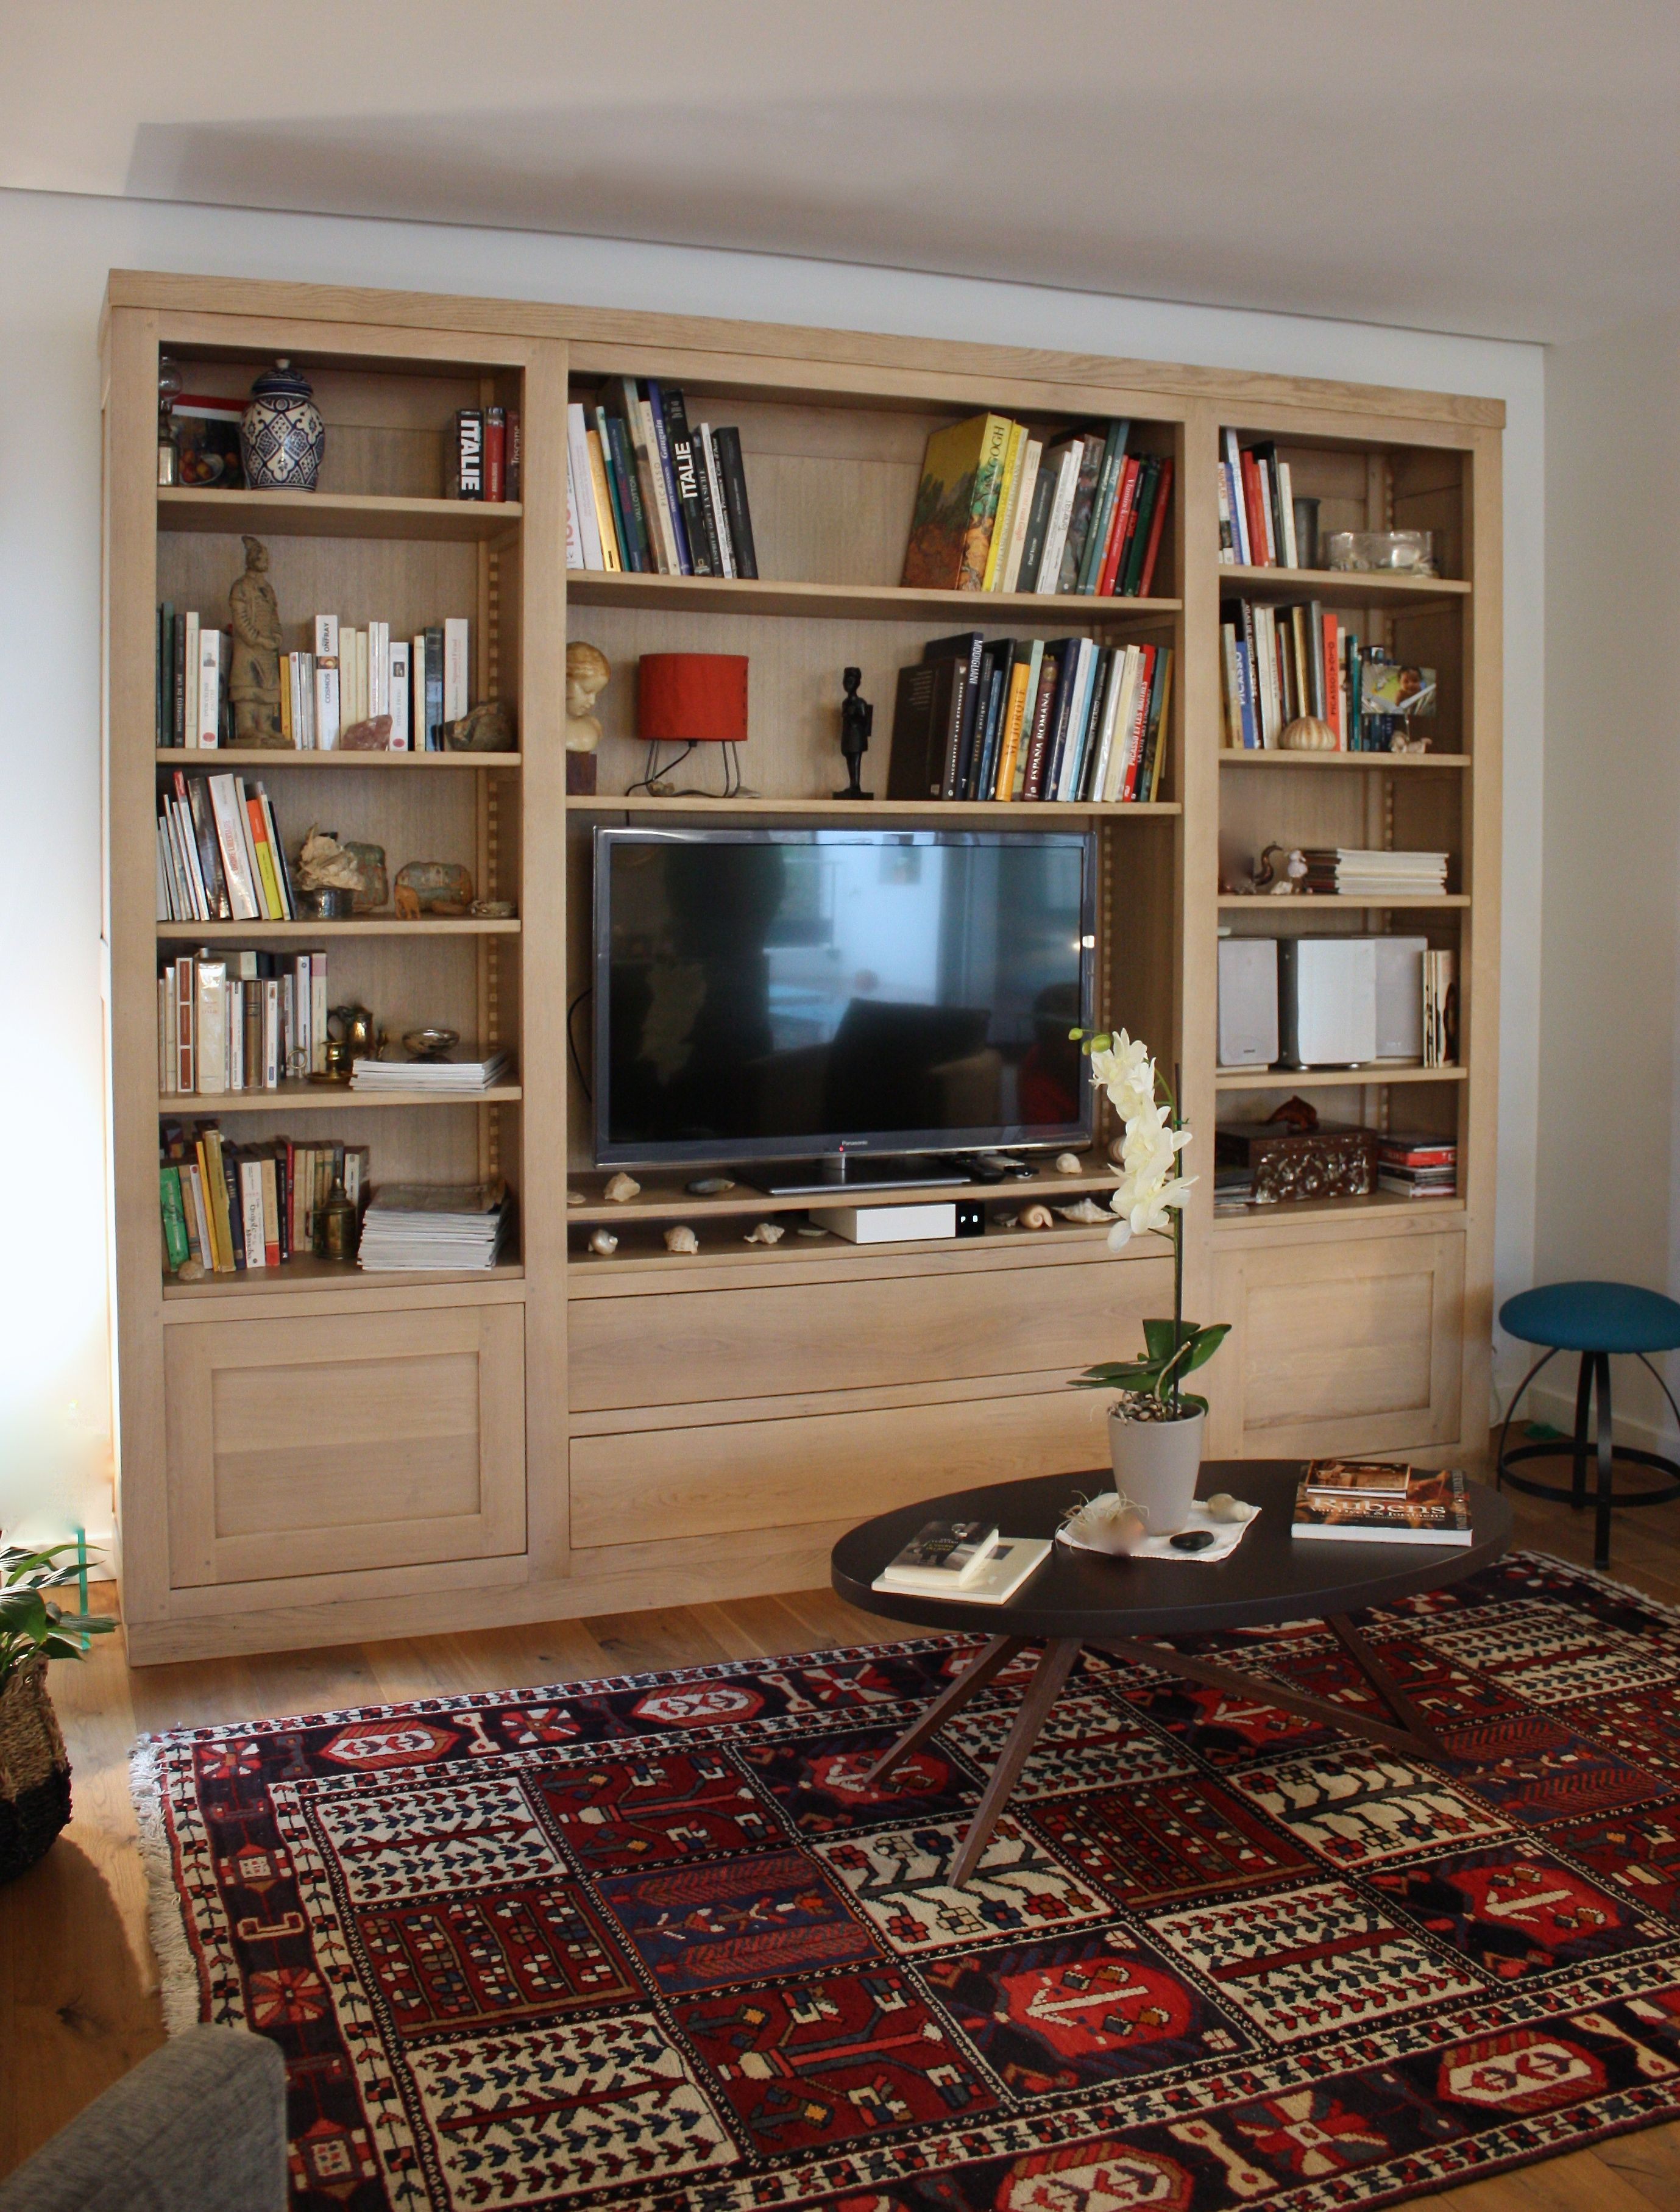 bibliotheque meuble tv meuble contemporain realise en chene massif sur mesure made in france